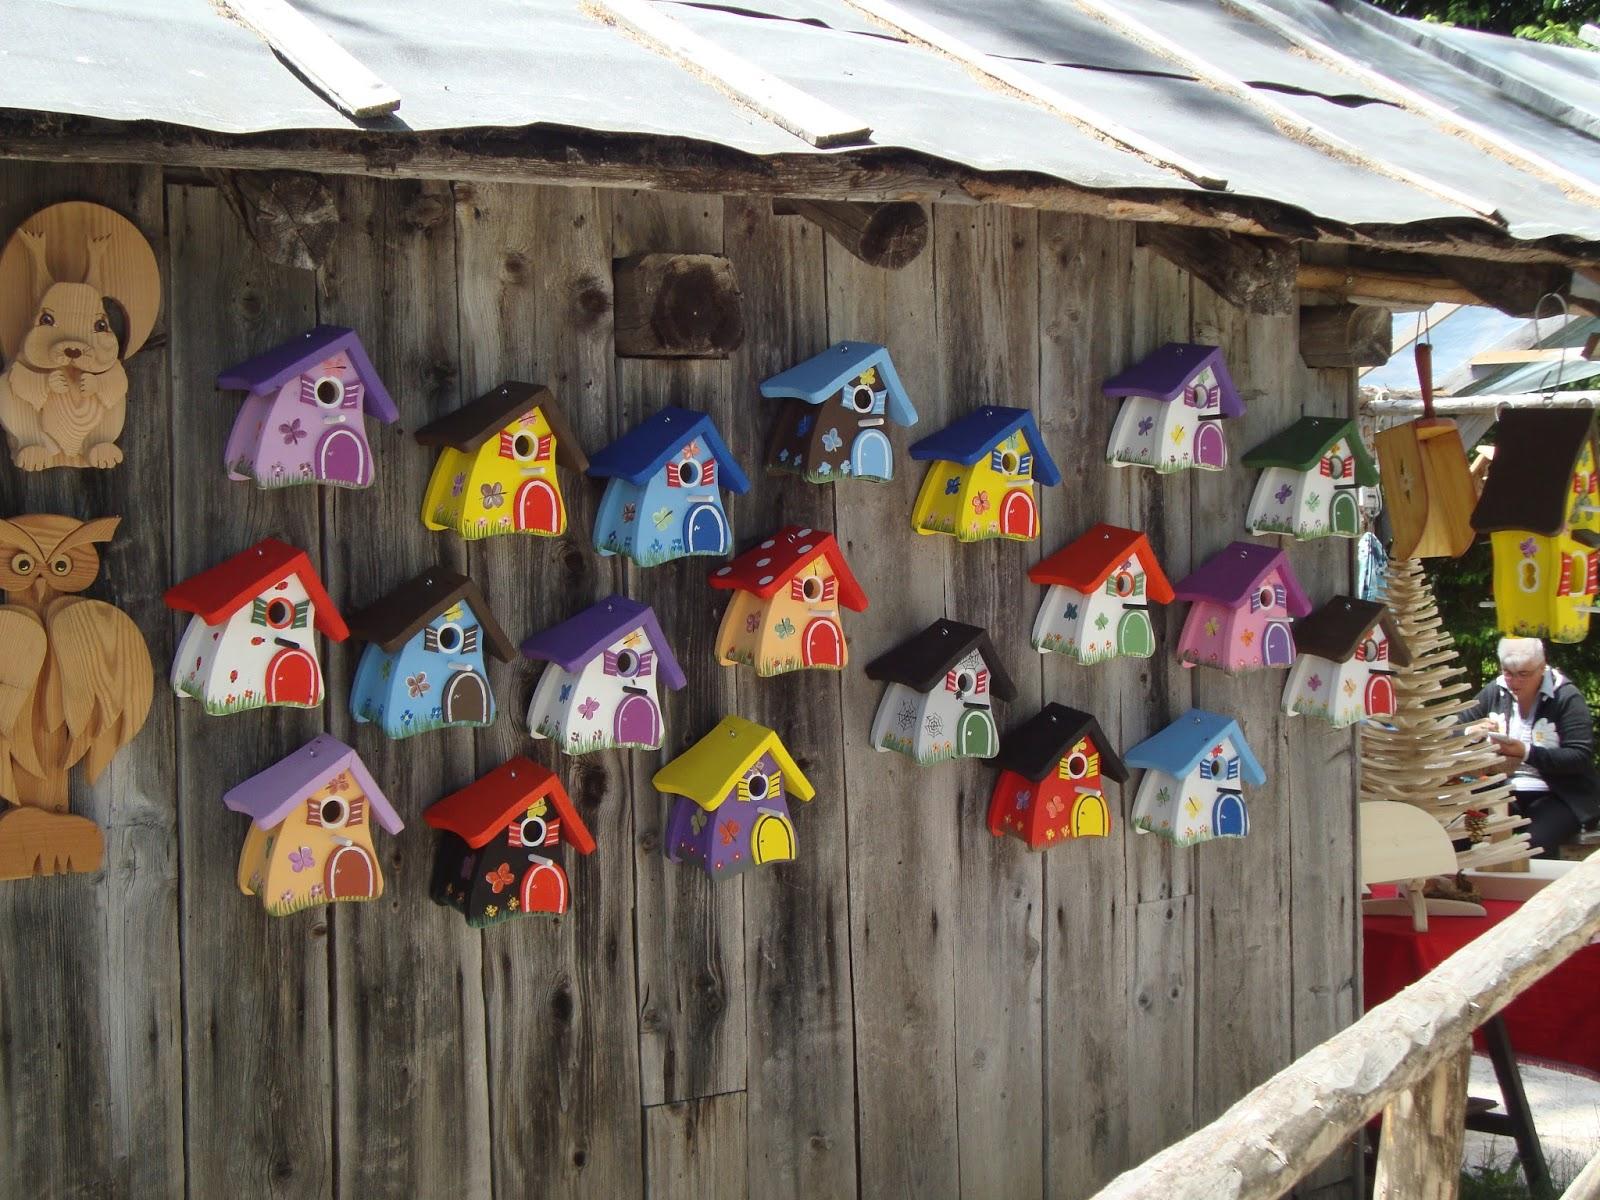 Célèbre Casette per uccellini | Foto-diario di una giardiniera curiosa XG51